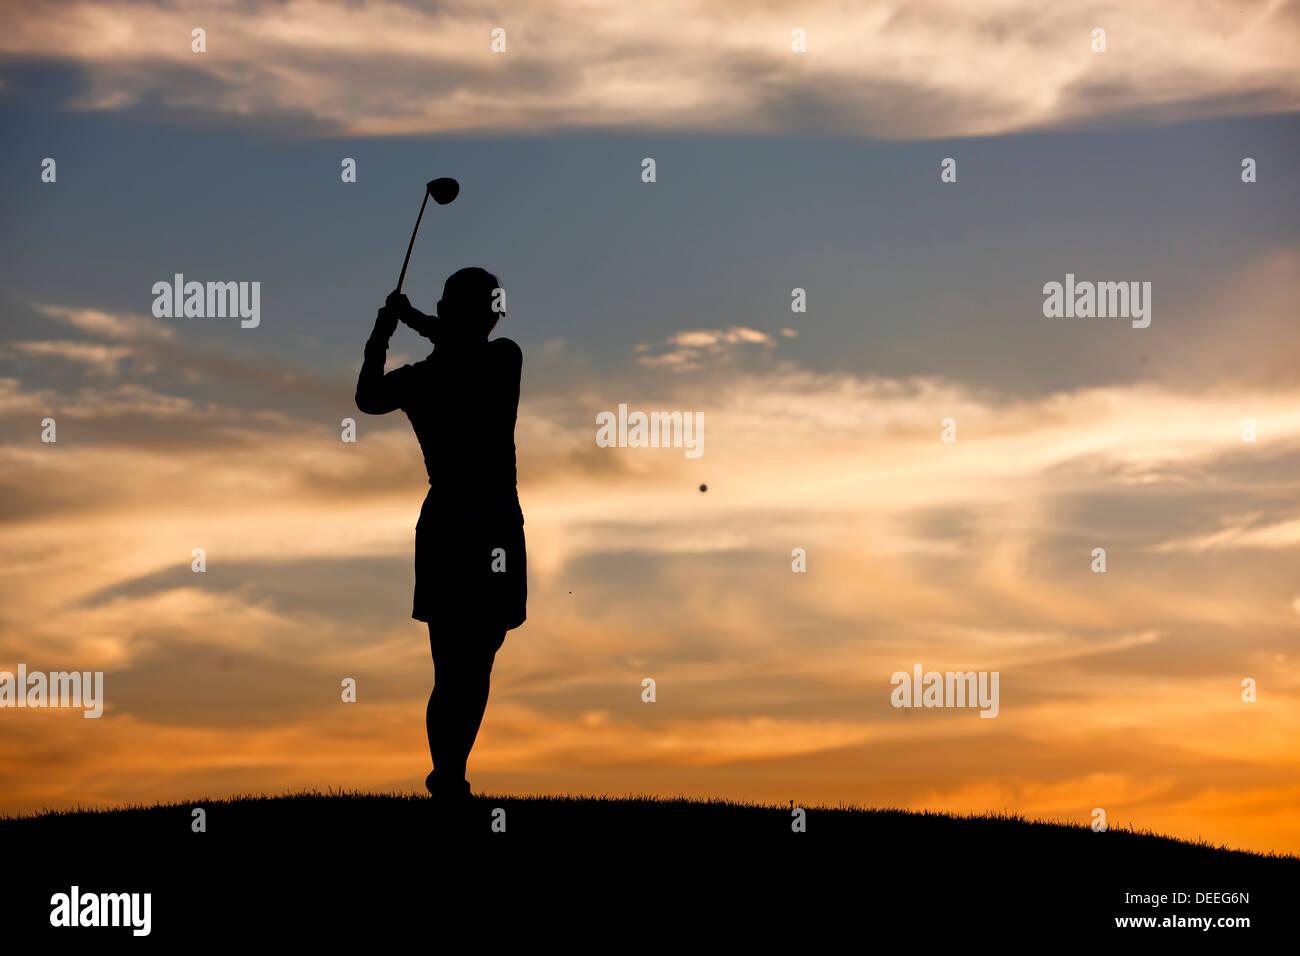 Golpear la bola de golf al atardecer. Imagen De Stock